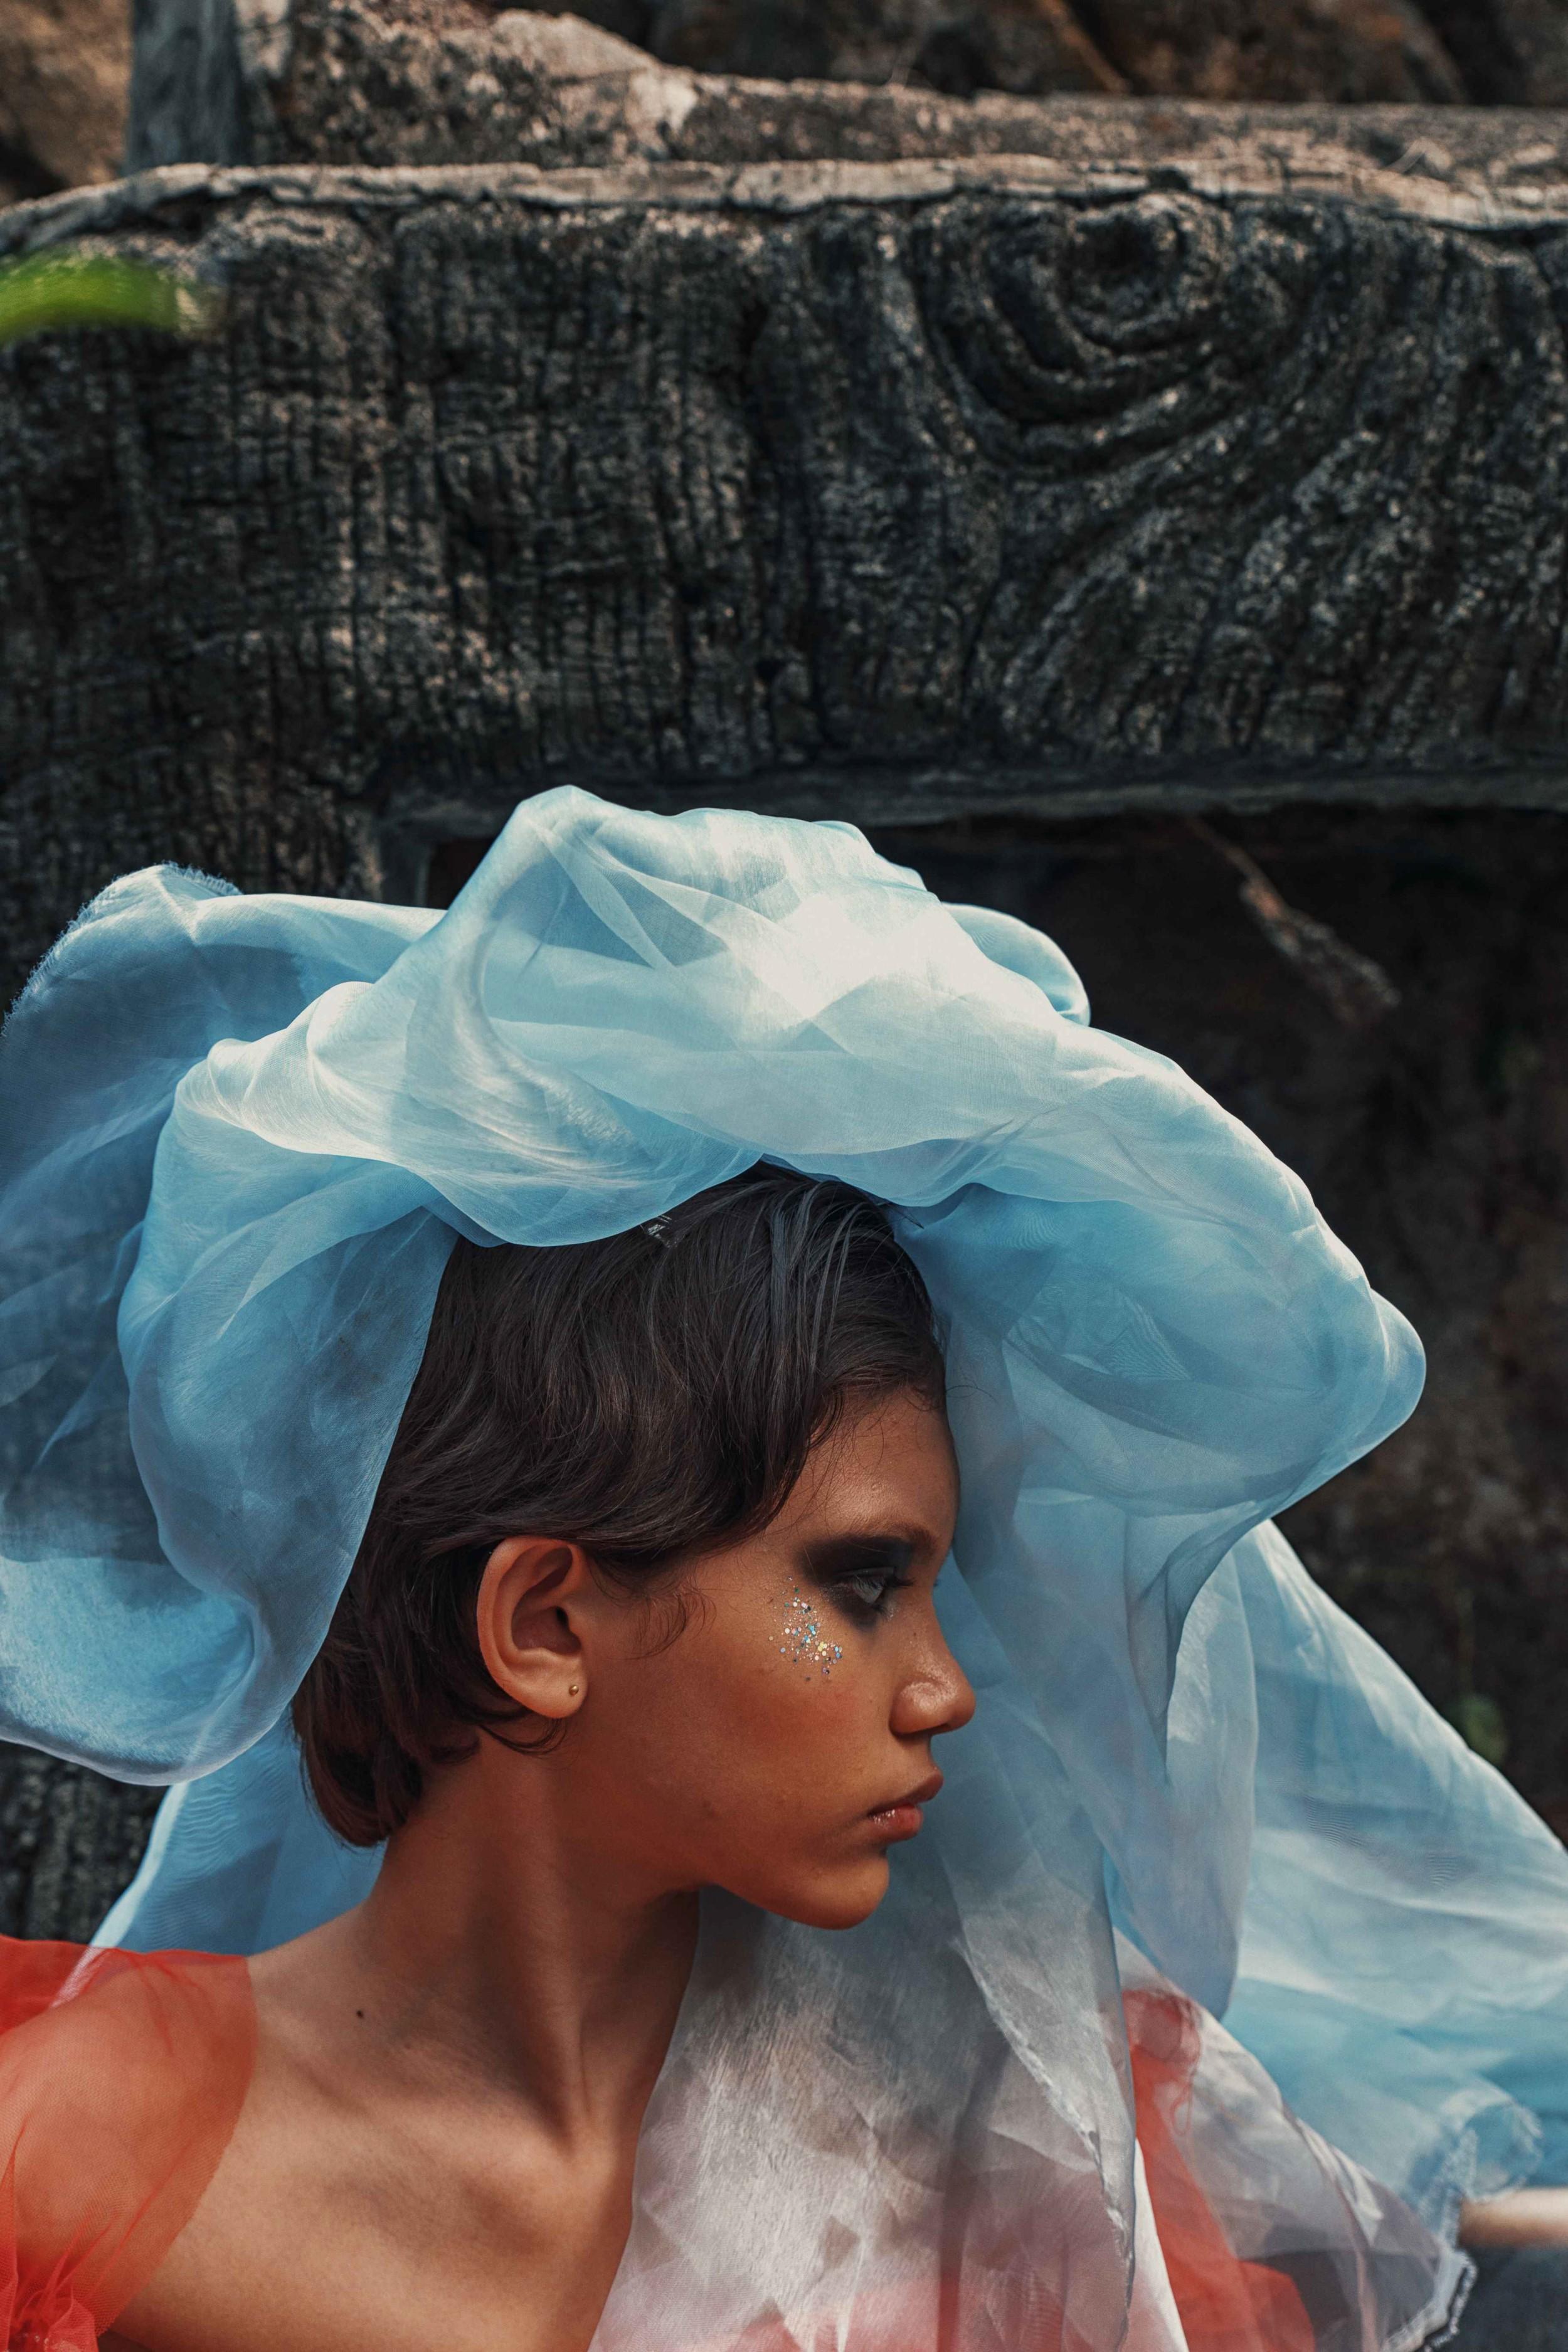 Indonesian Photographer Bintang Adamas 'Shakira' Series for Through the Photographer's Lens, Globetroter Magazine (12).jpg